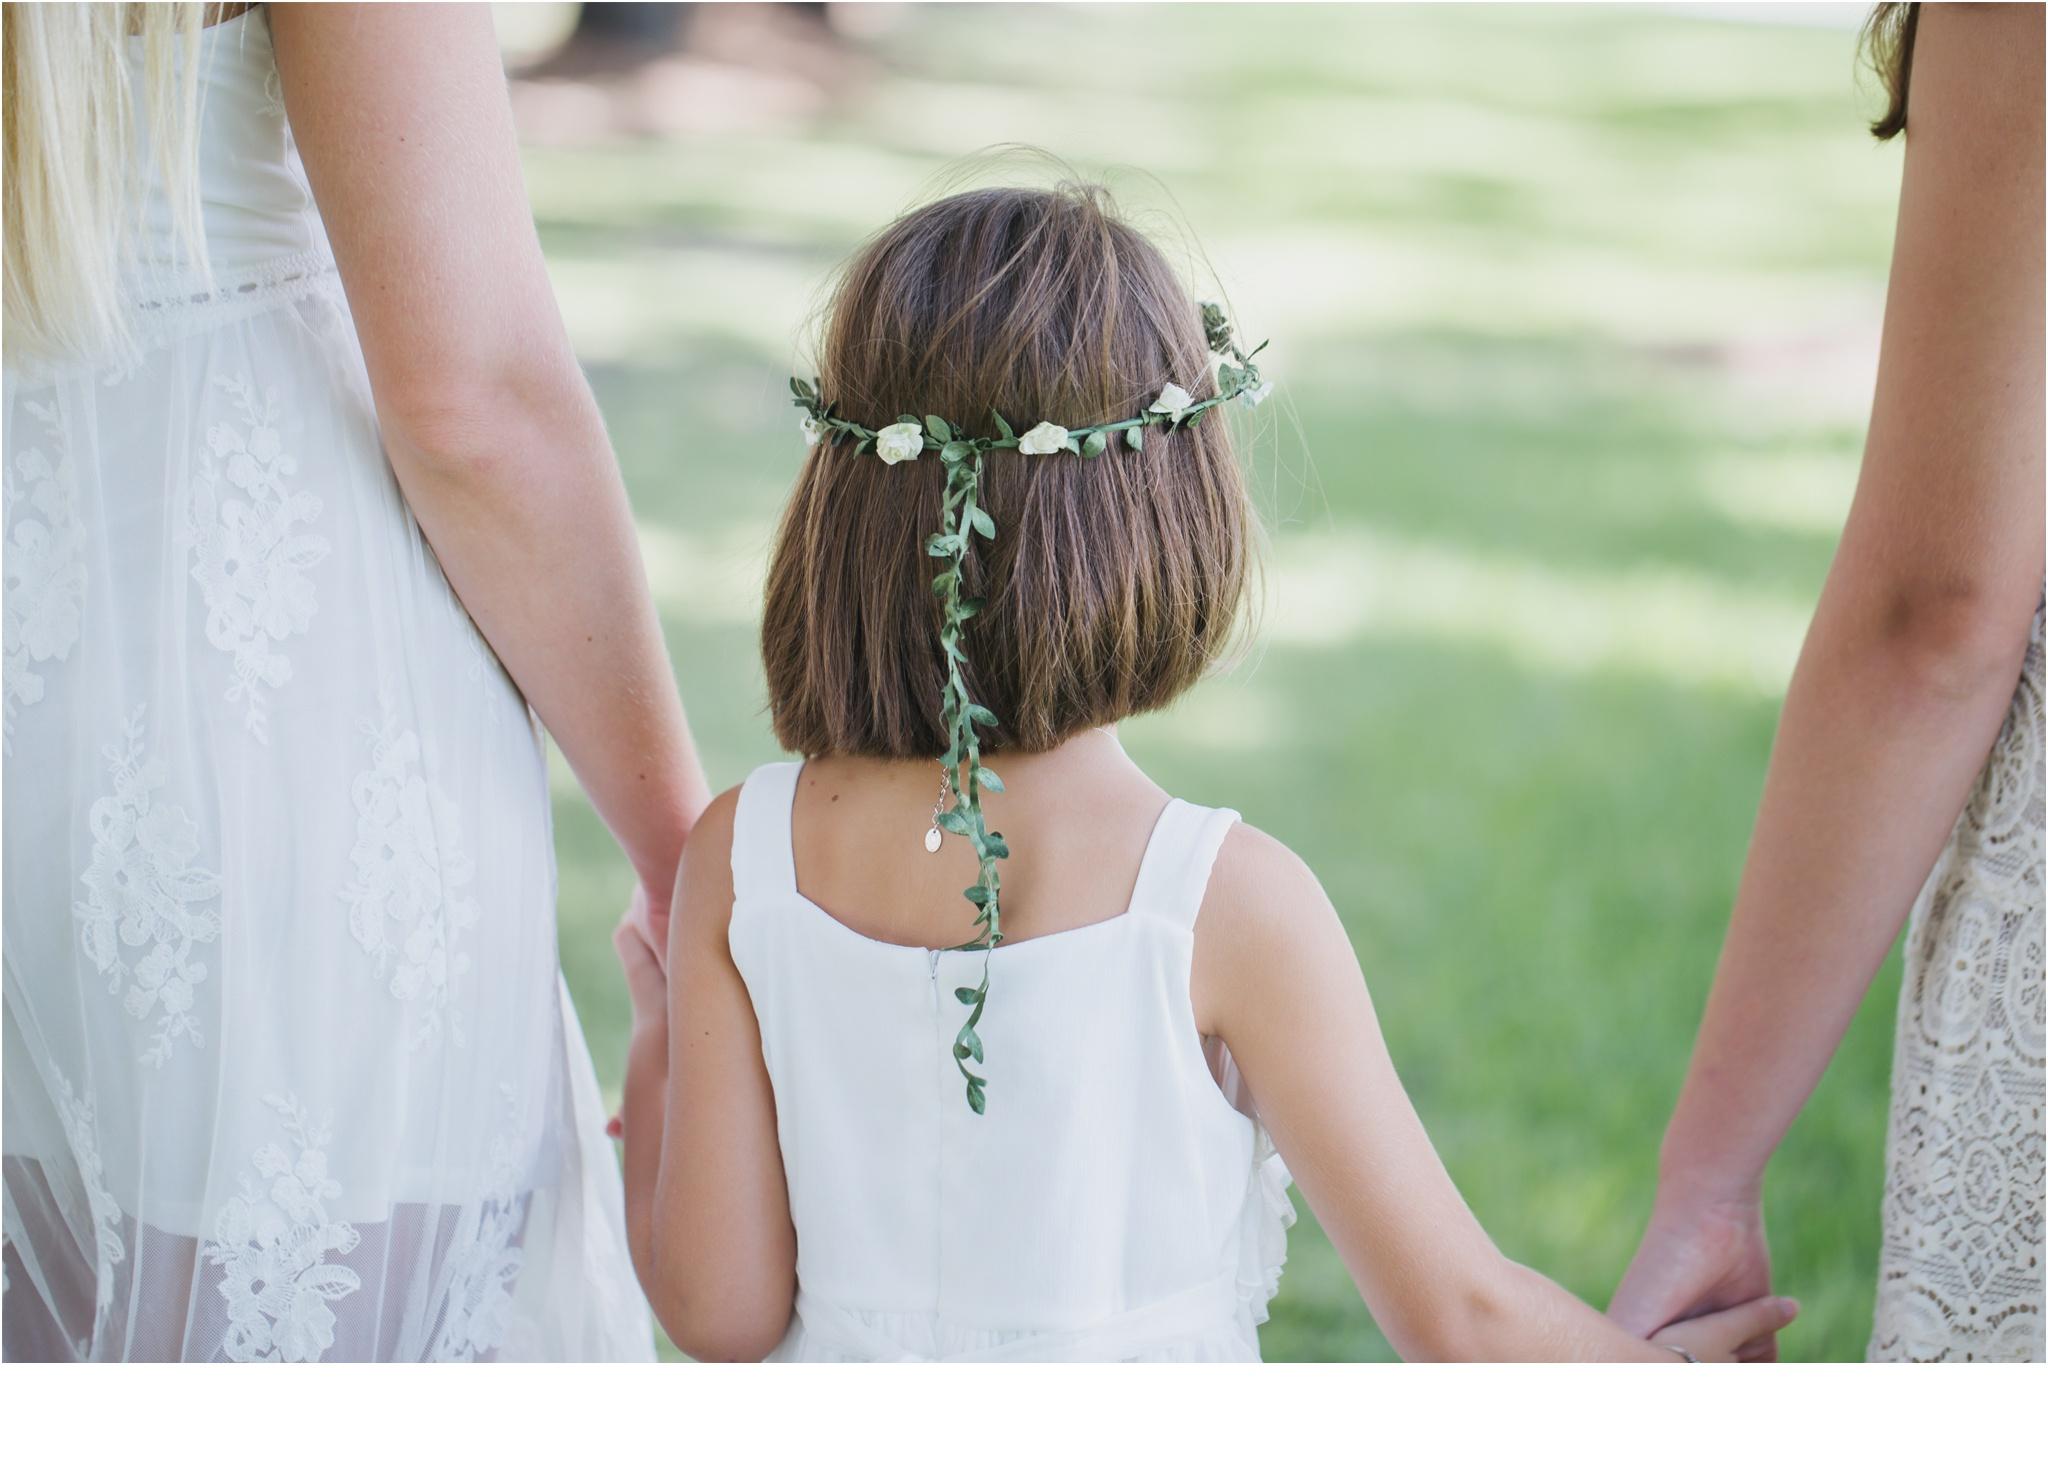 Rainey_Gregg_Photography_St._Simons_Island_Georgia_California_Wedding_Portrait_Photography_1106.jpg